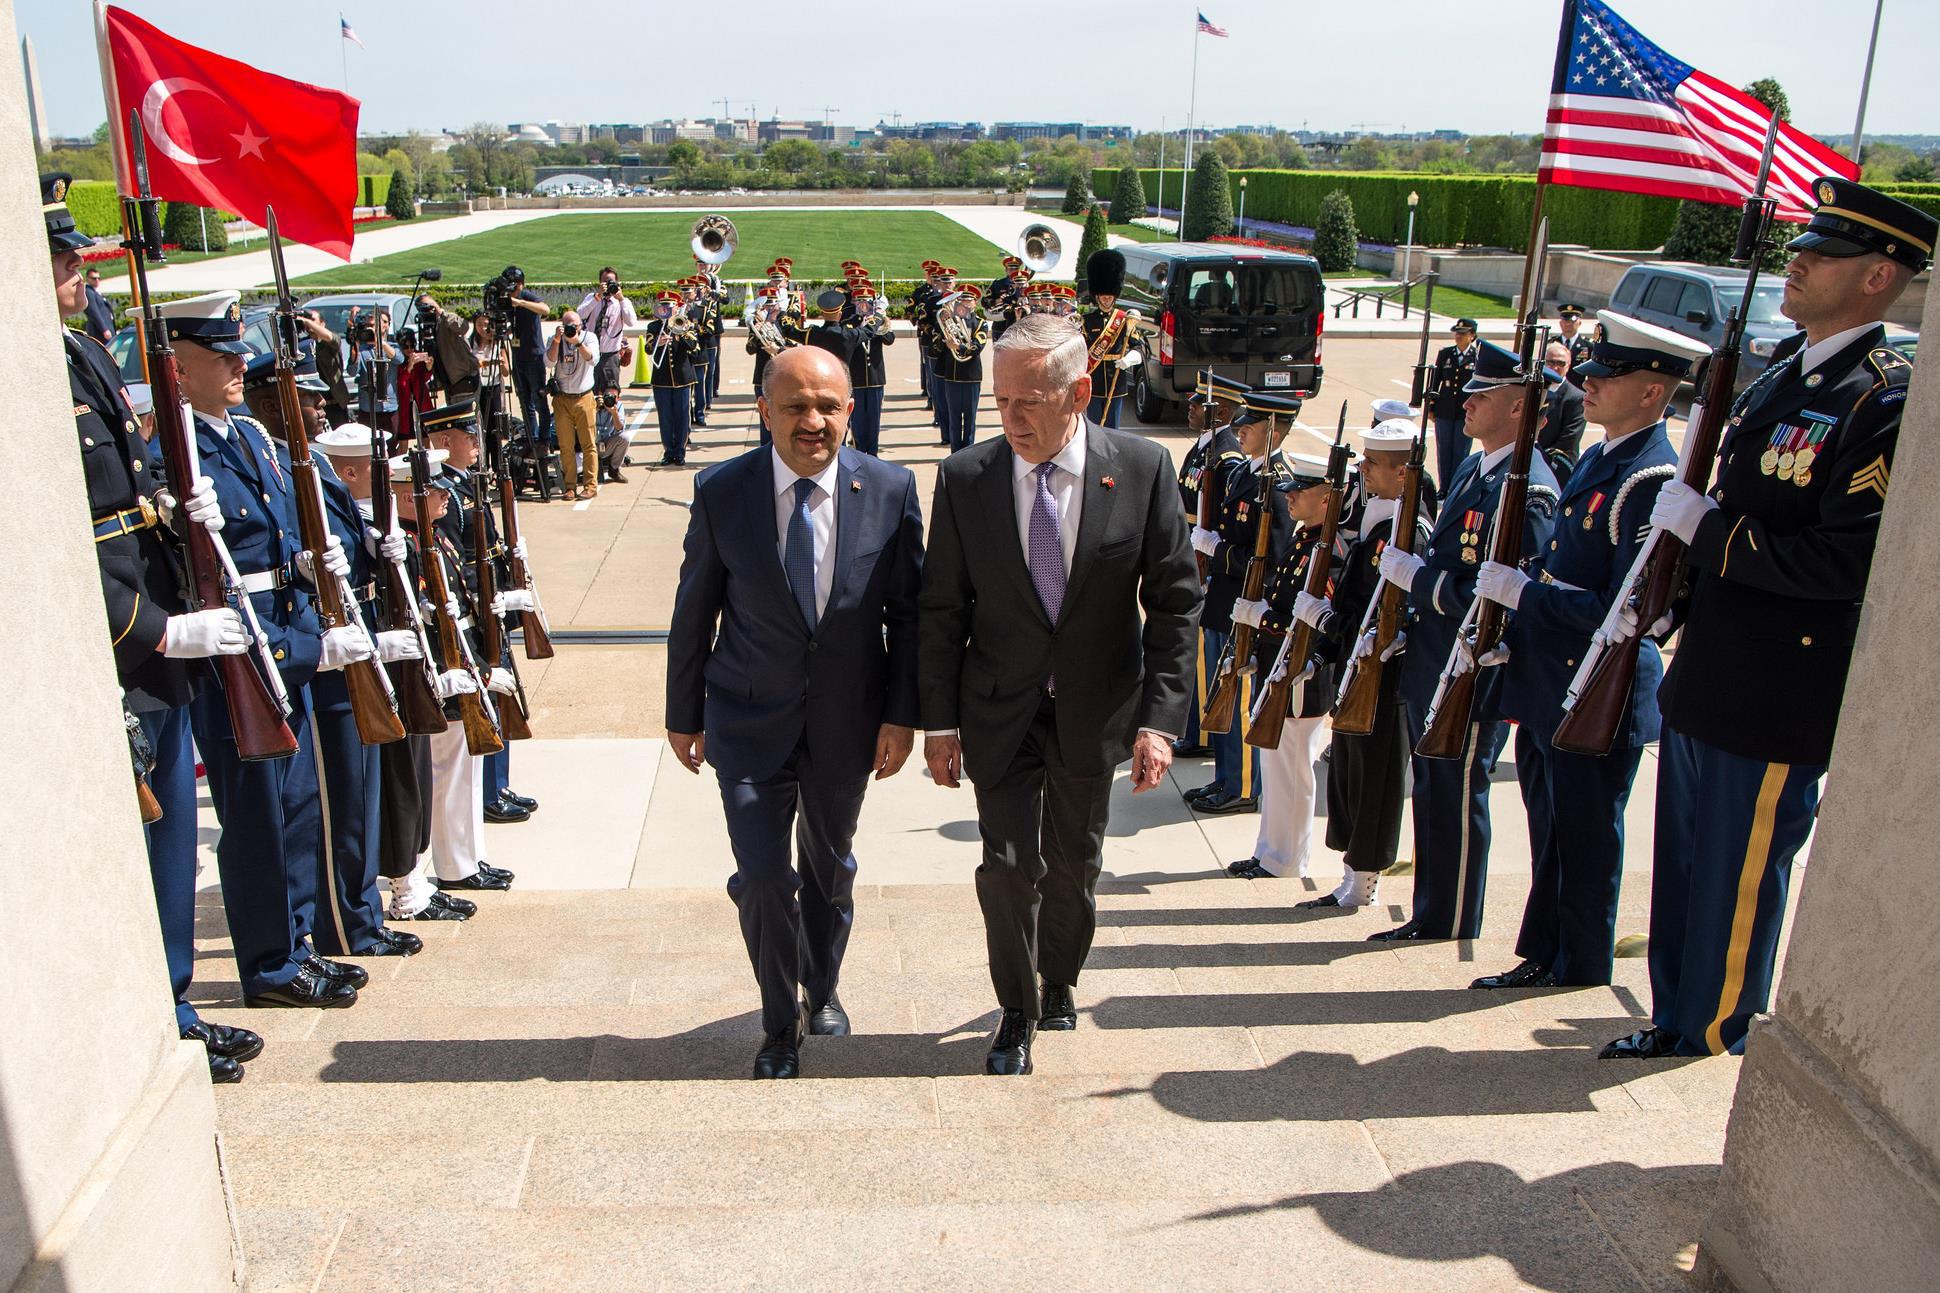 Defense Secretary Jim Mattis, right, welcomes Turkish Defense Minister Fikri Işık to the Pentagon